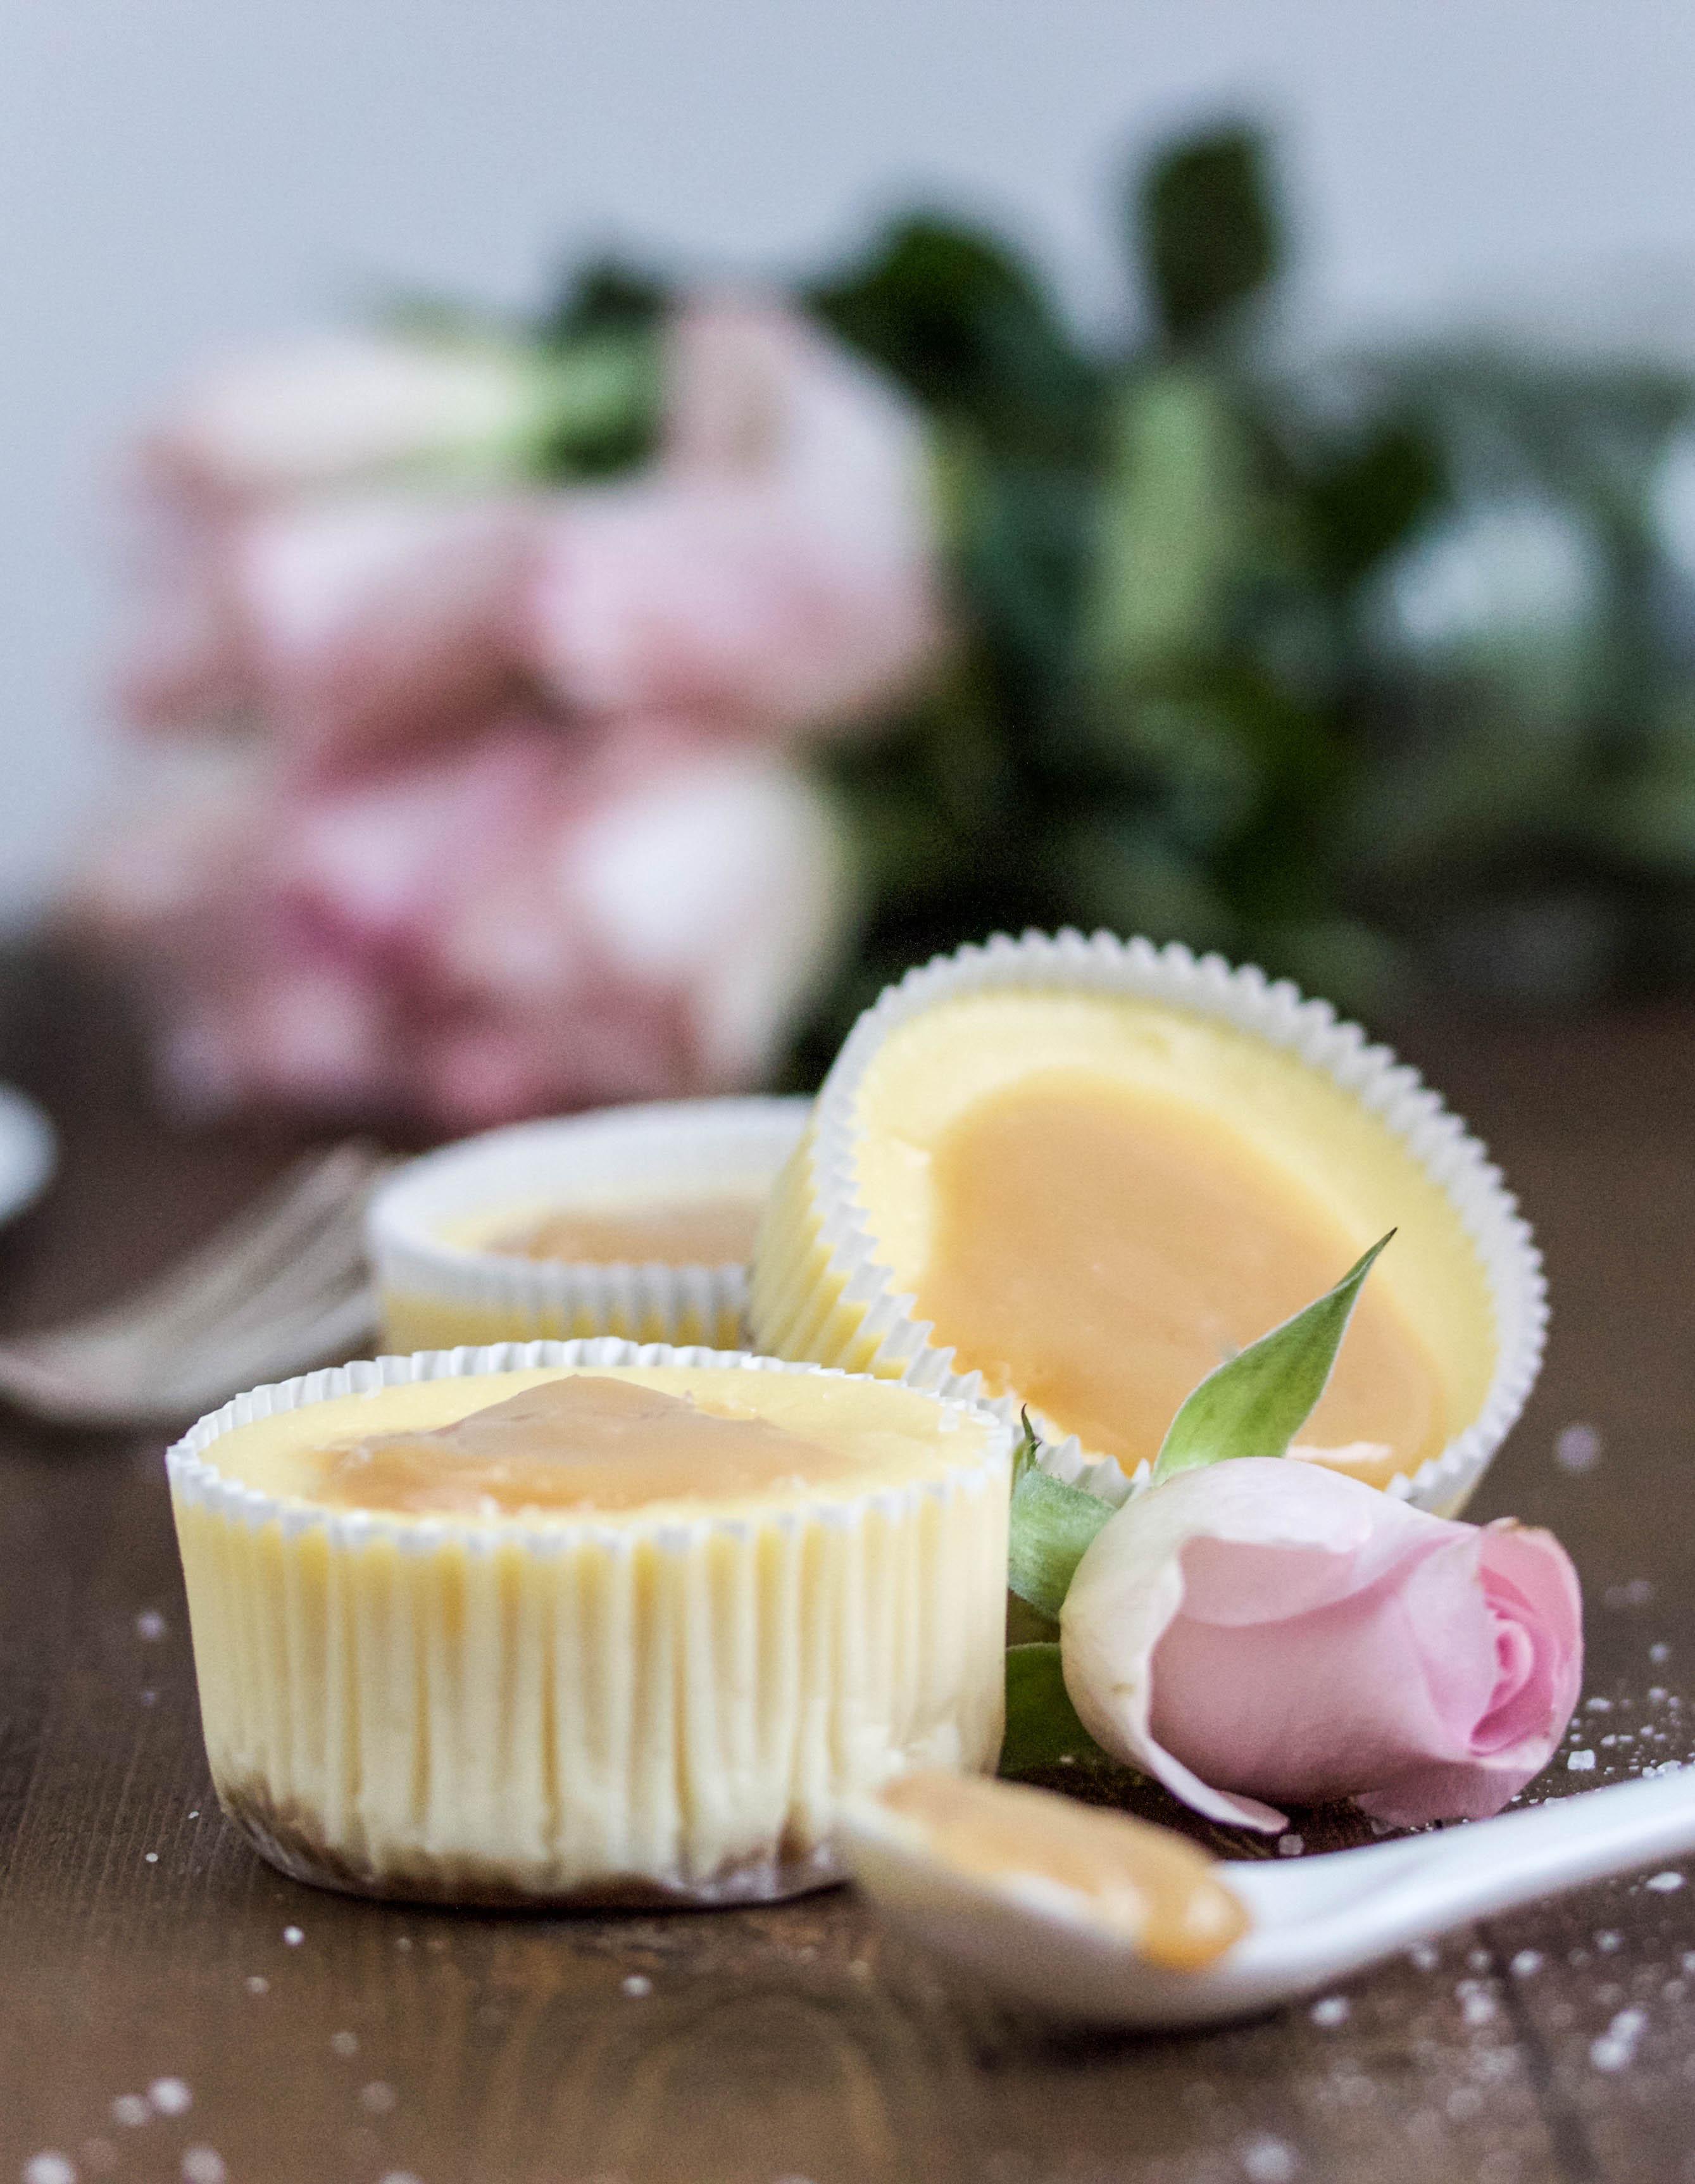 Einfaches Rezept für Dulche de Leiche Cheesecakes Salzkaramell Salted Karamell #muffins #cheesecake #muffins #caramell